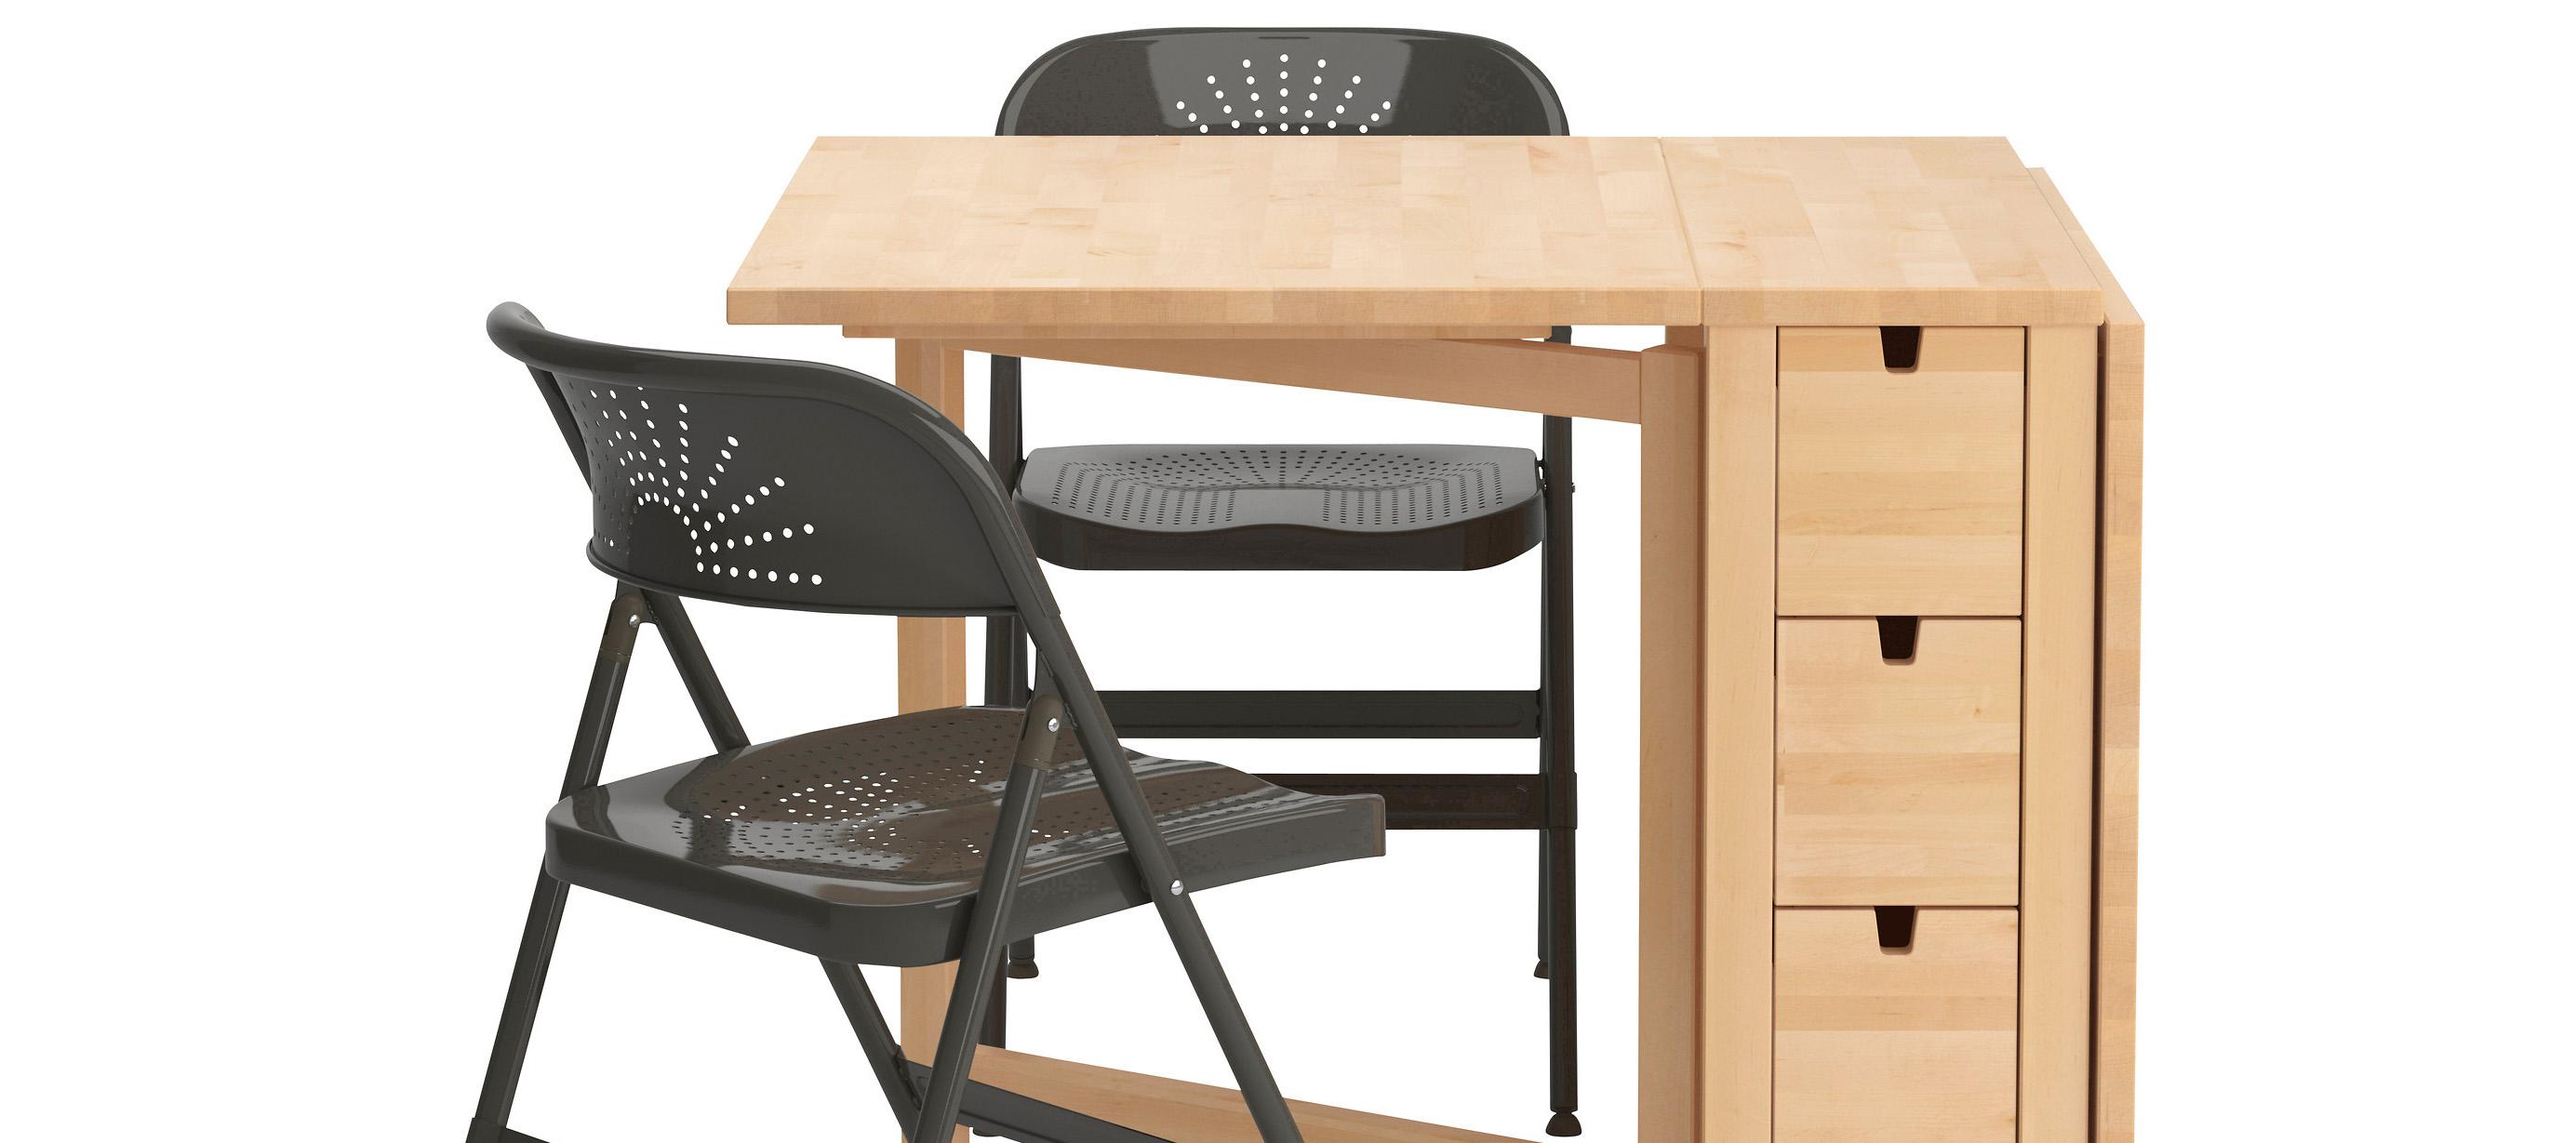 Стол-книжка Икеа: творческий подход к мебели